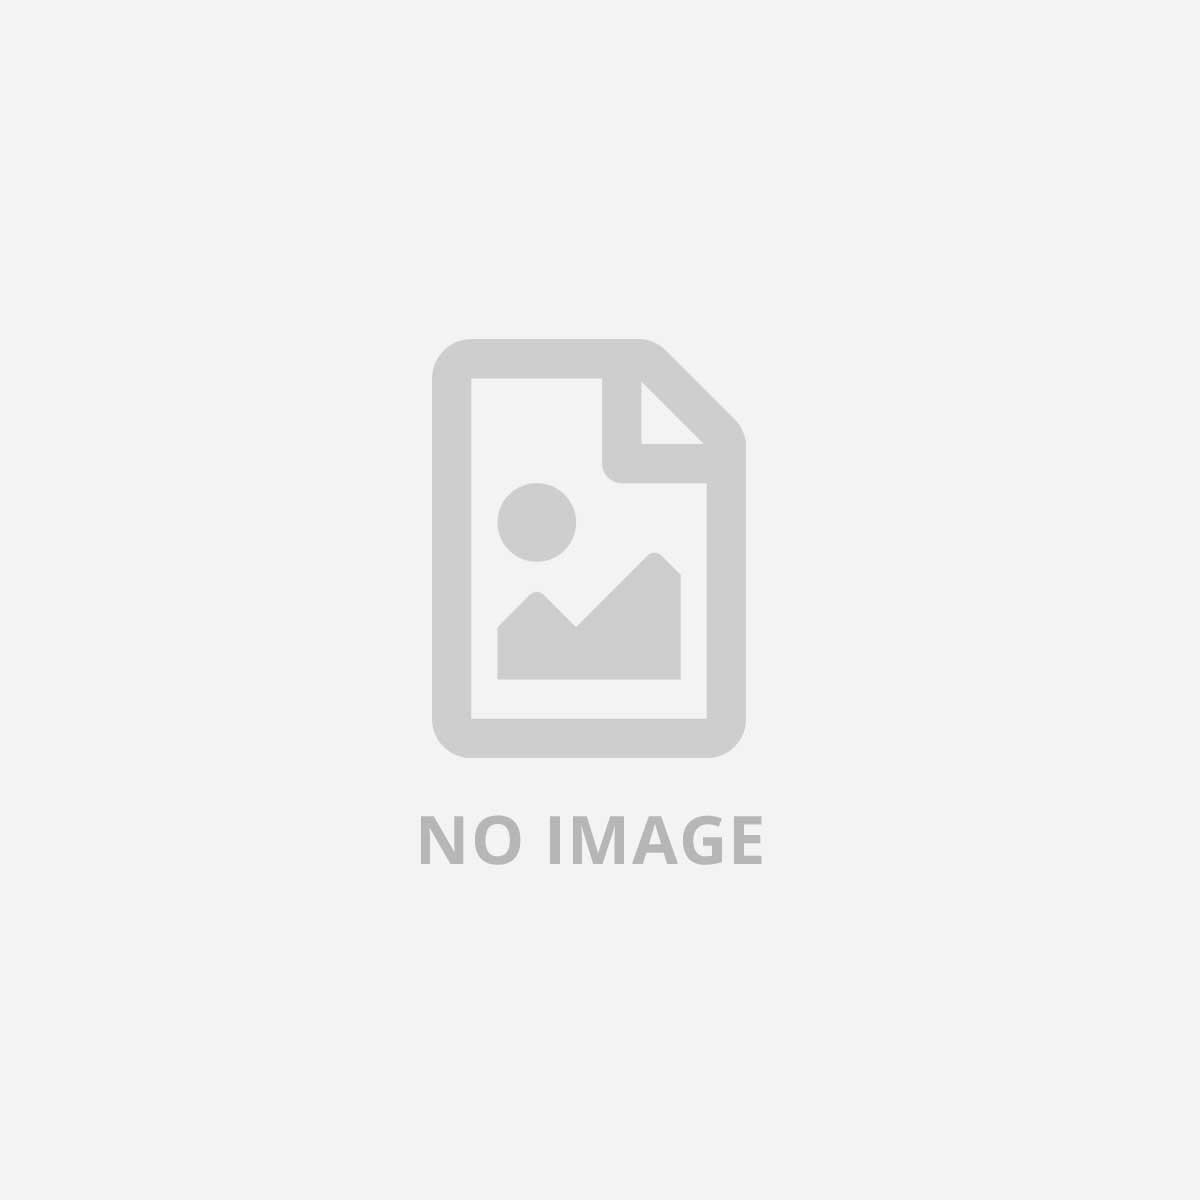 MONDI RISMA COLOR COPY A4 250GR 125FF